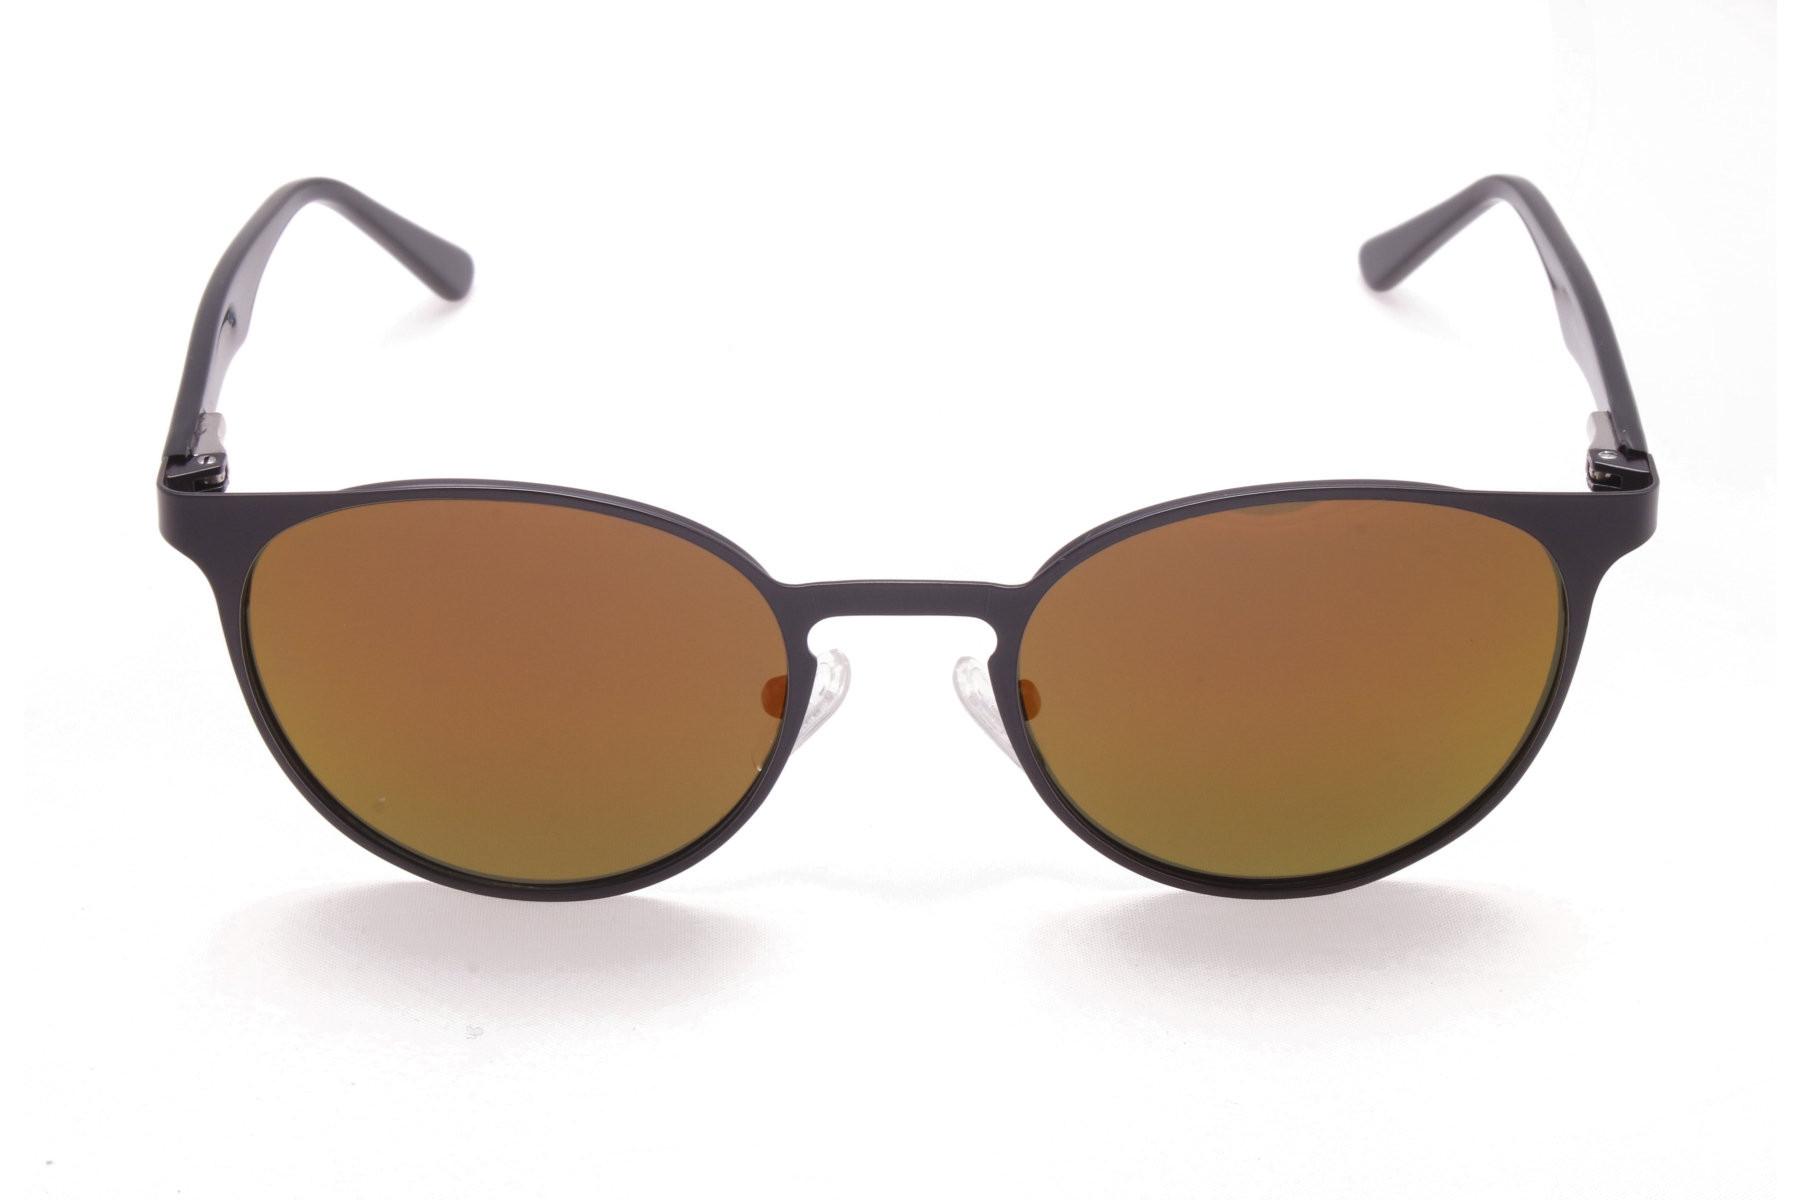 Brown & Green Lens Sunglasses- 2